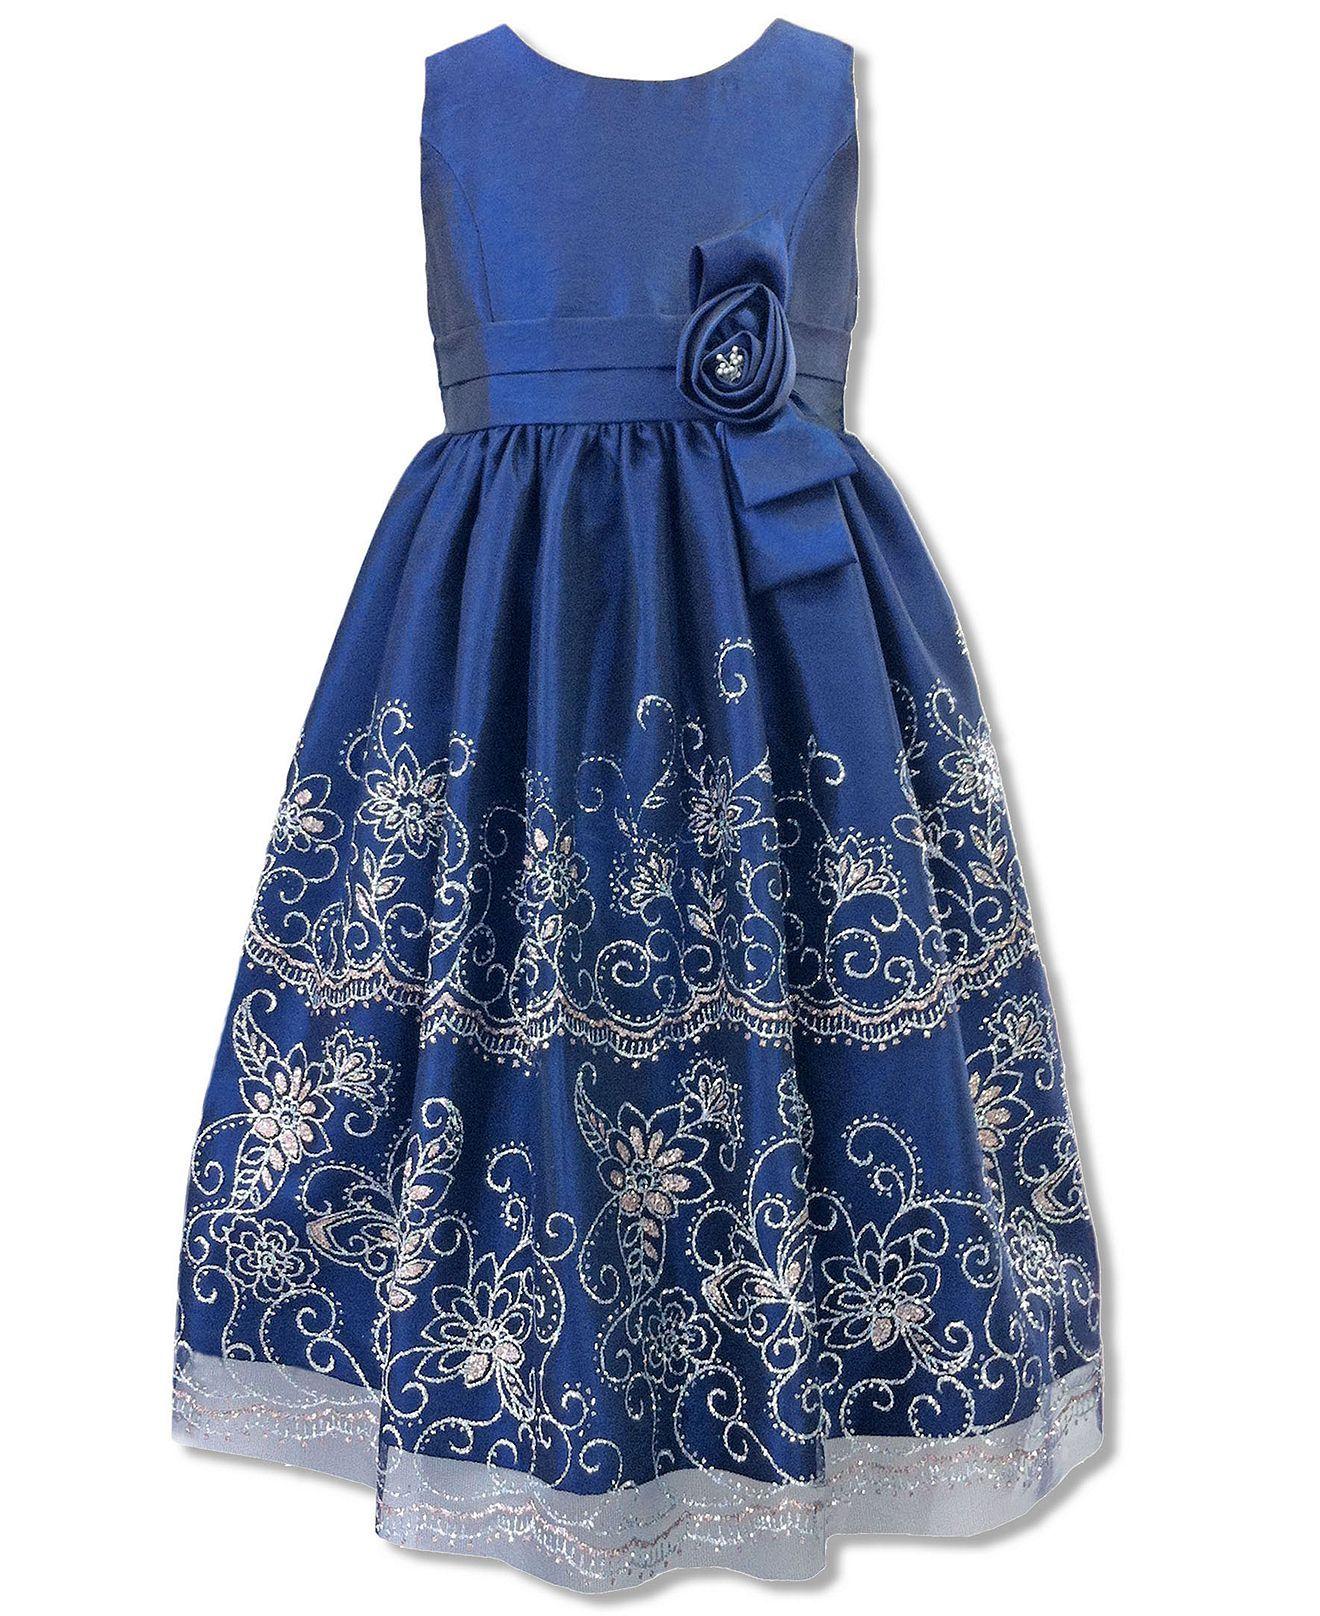 Jayne Copeland Kids Dress, Girls Sparkle Flower Border Dress ...